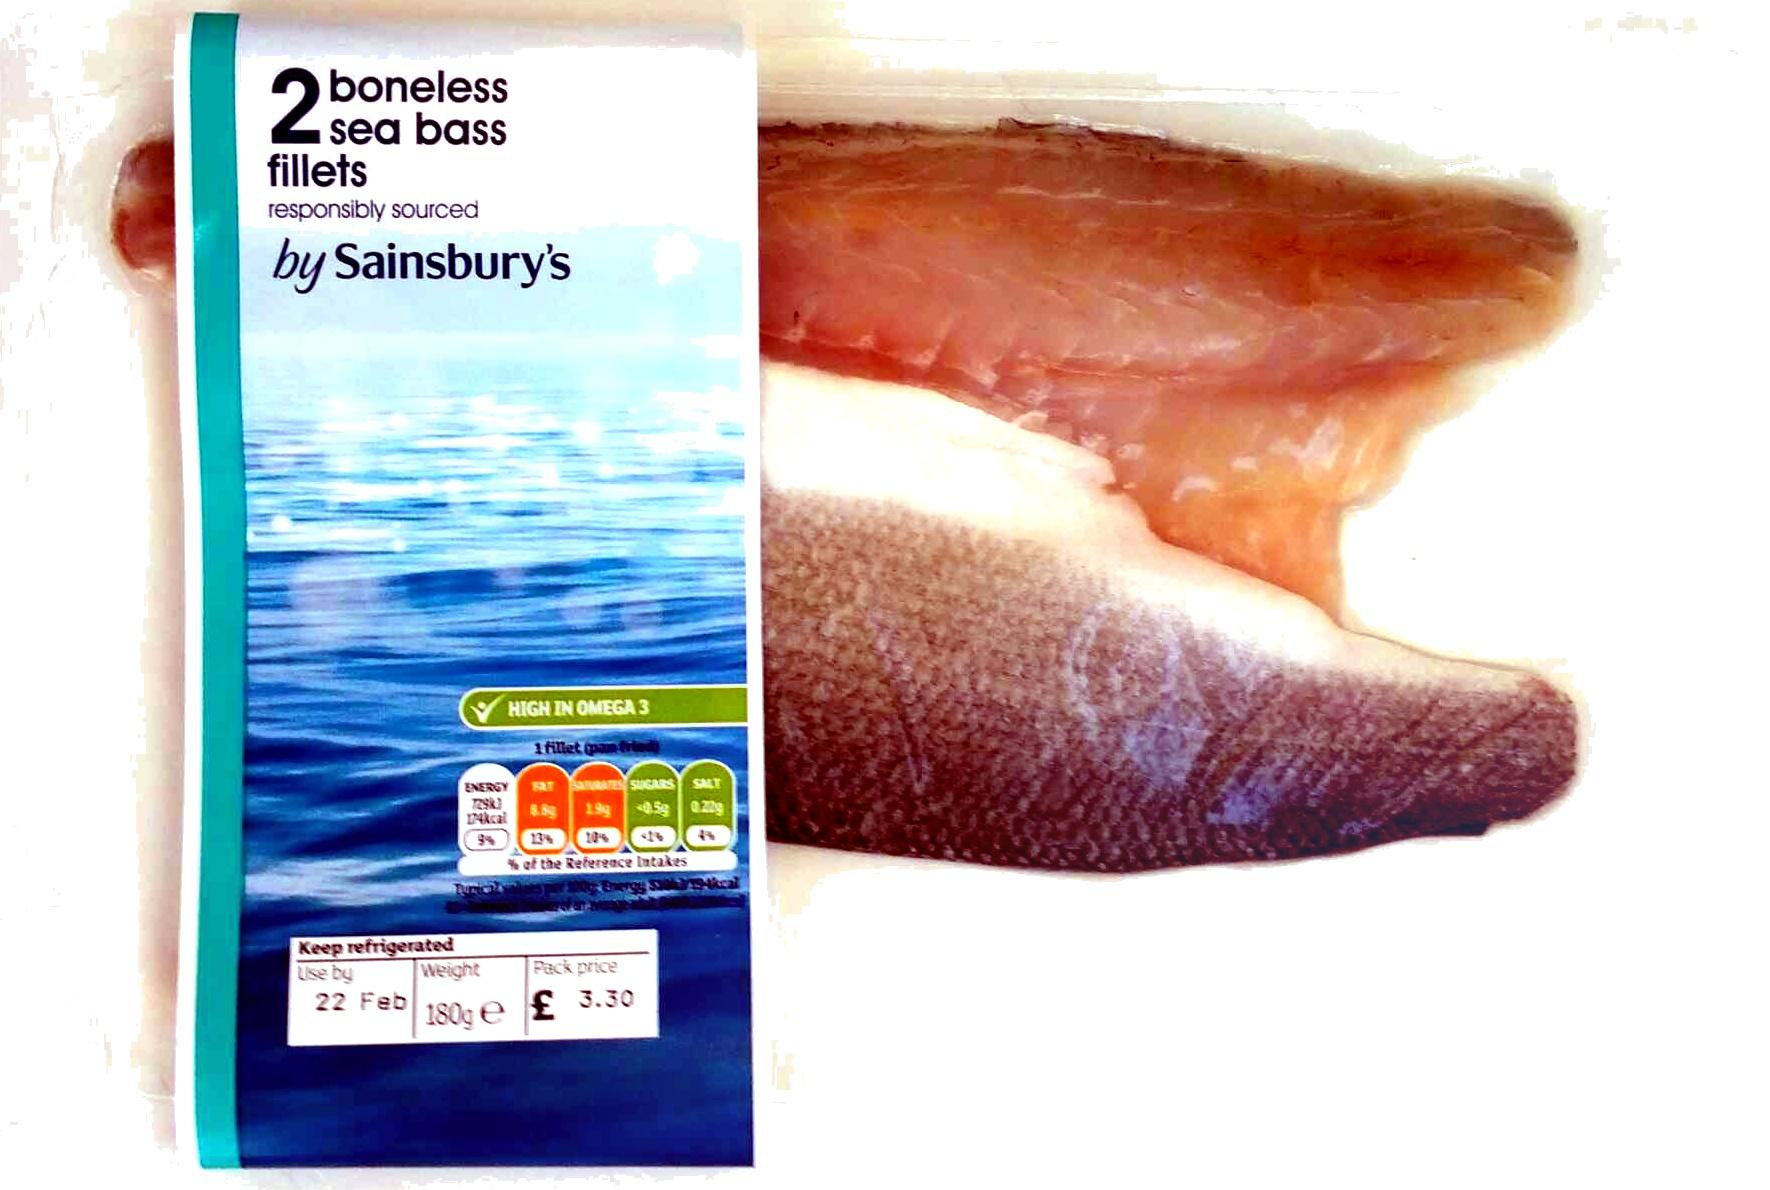 2 boneless seabass fillets - Produit